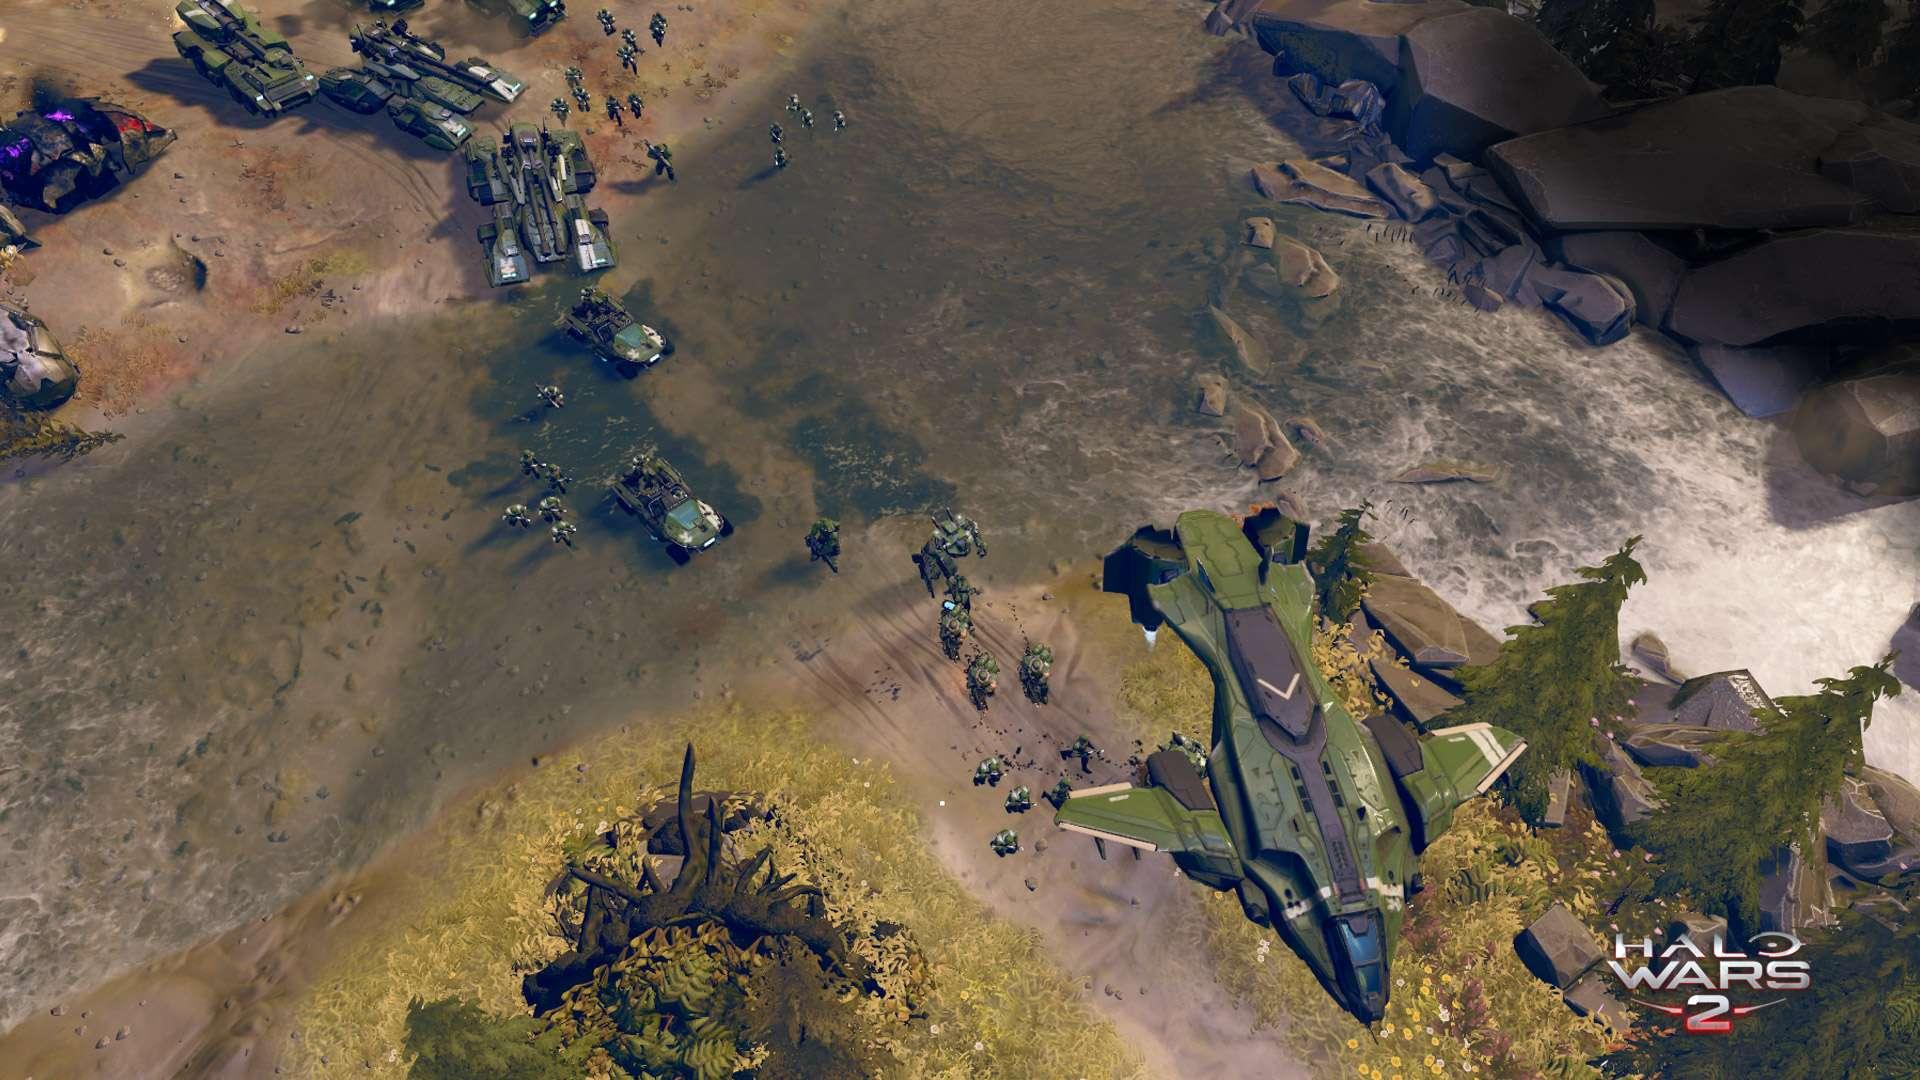 Halo Wars 2 free download PC game